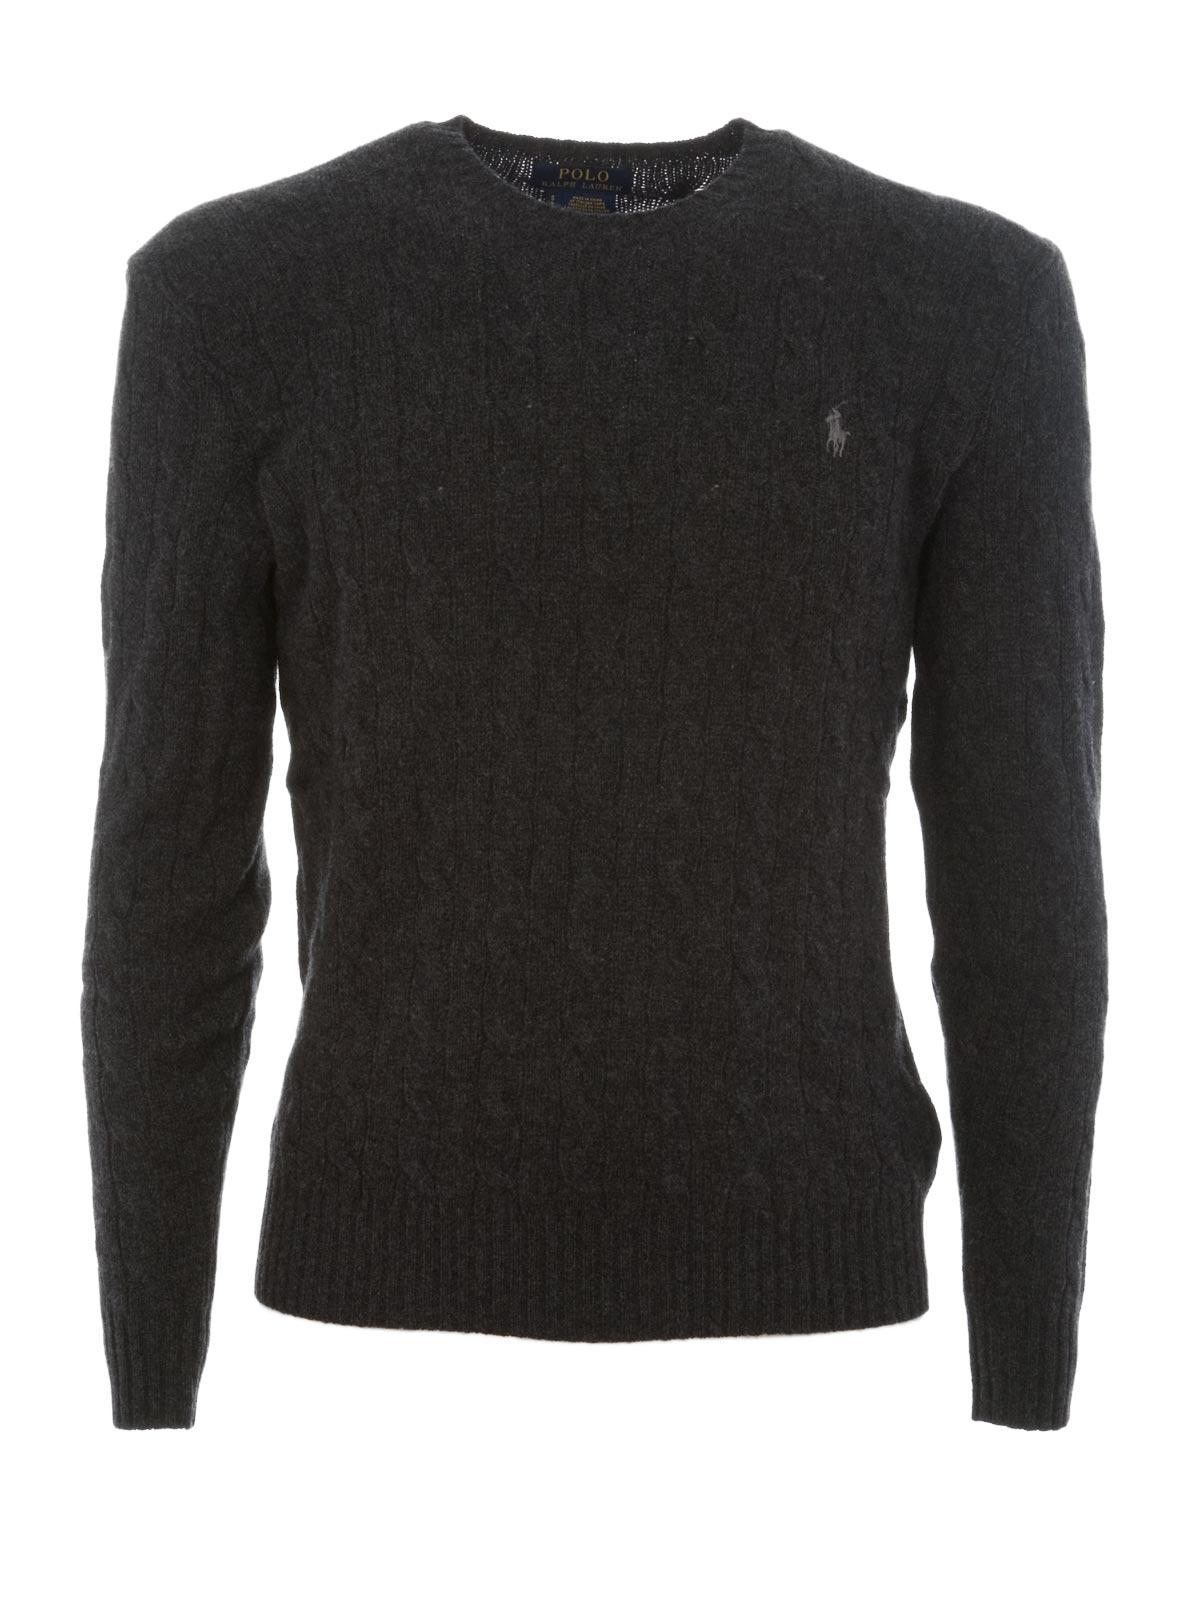 efd8bfc50 POLO RALPH LAUREN Cable-Knit Cashmere Sweater Dark Granite ...